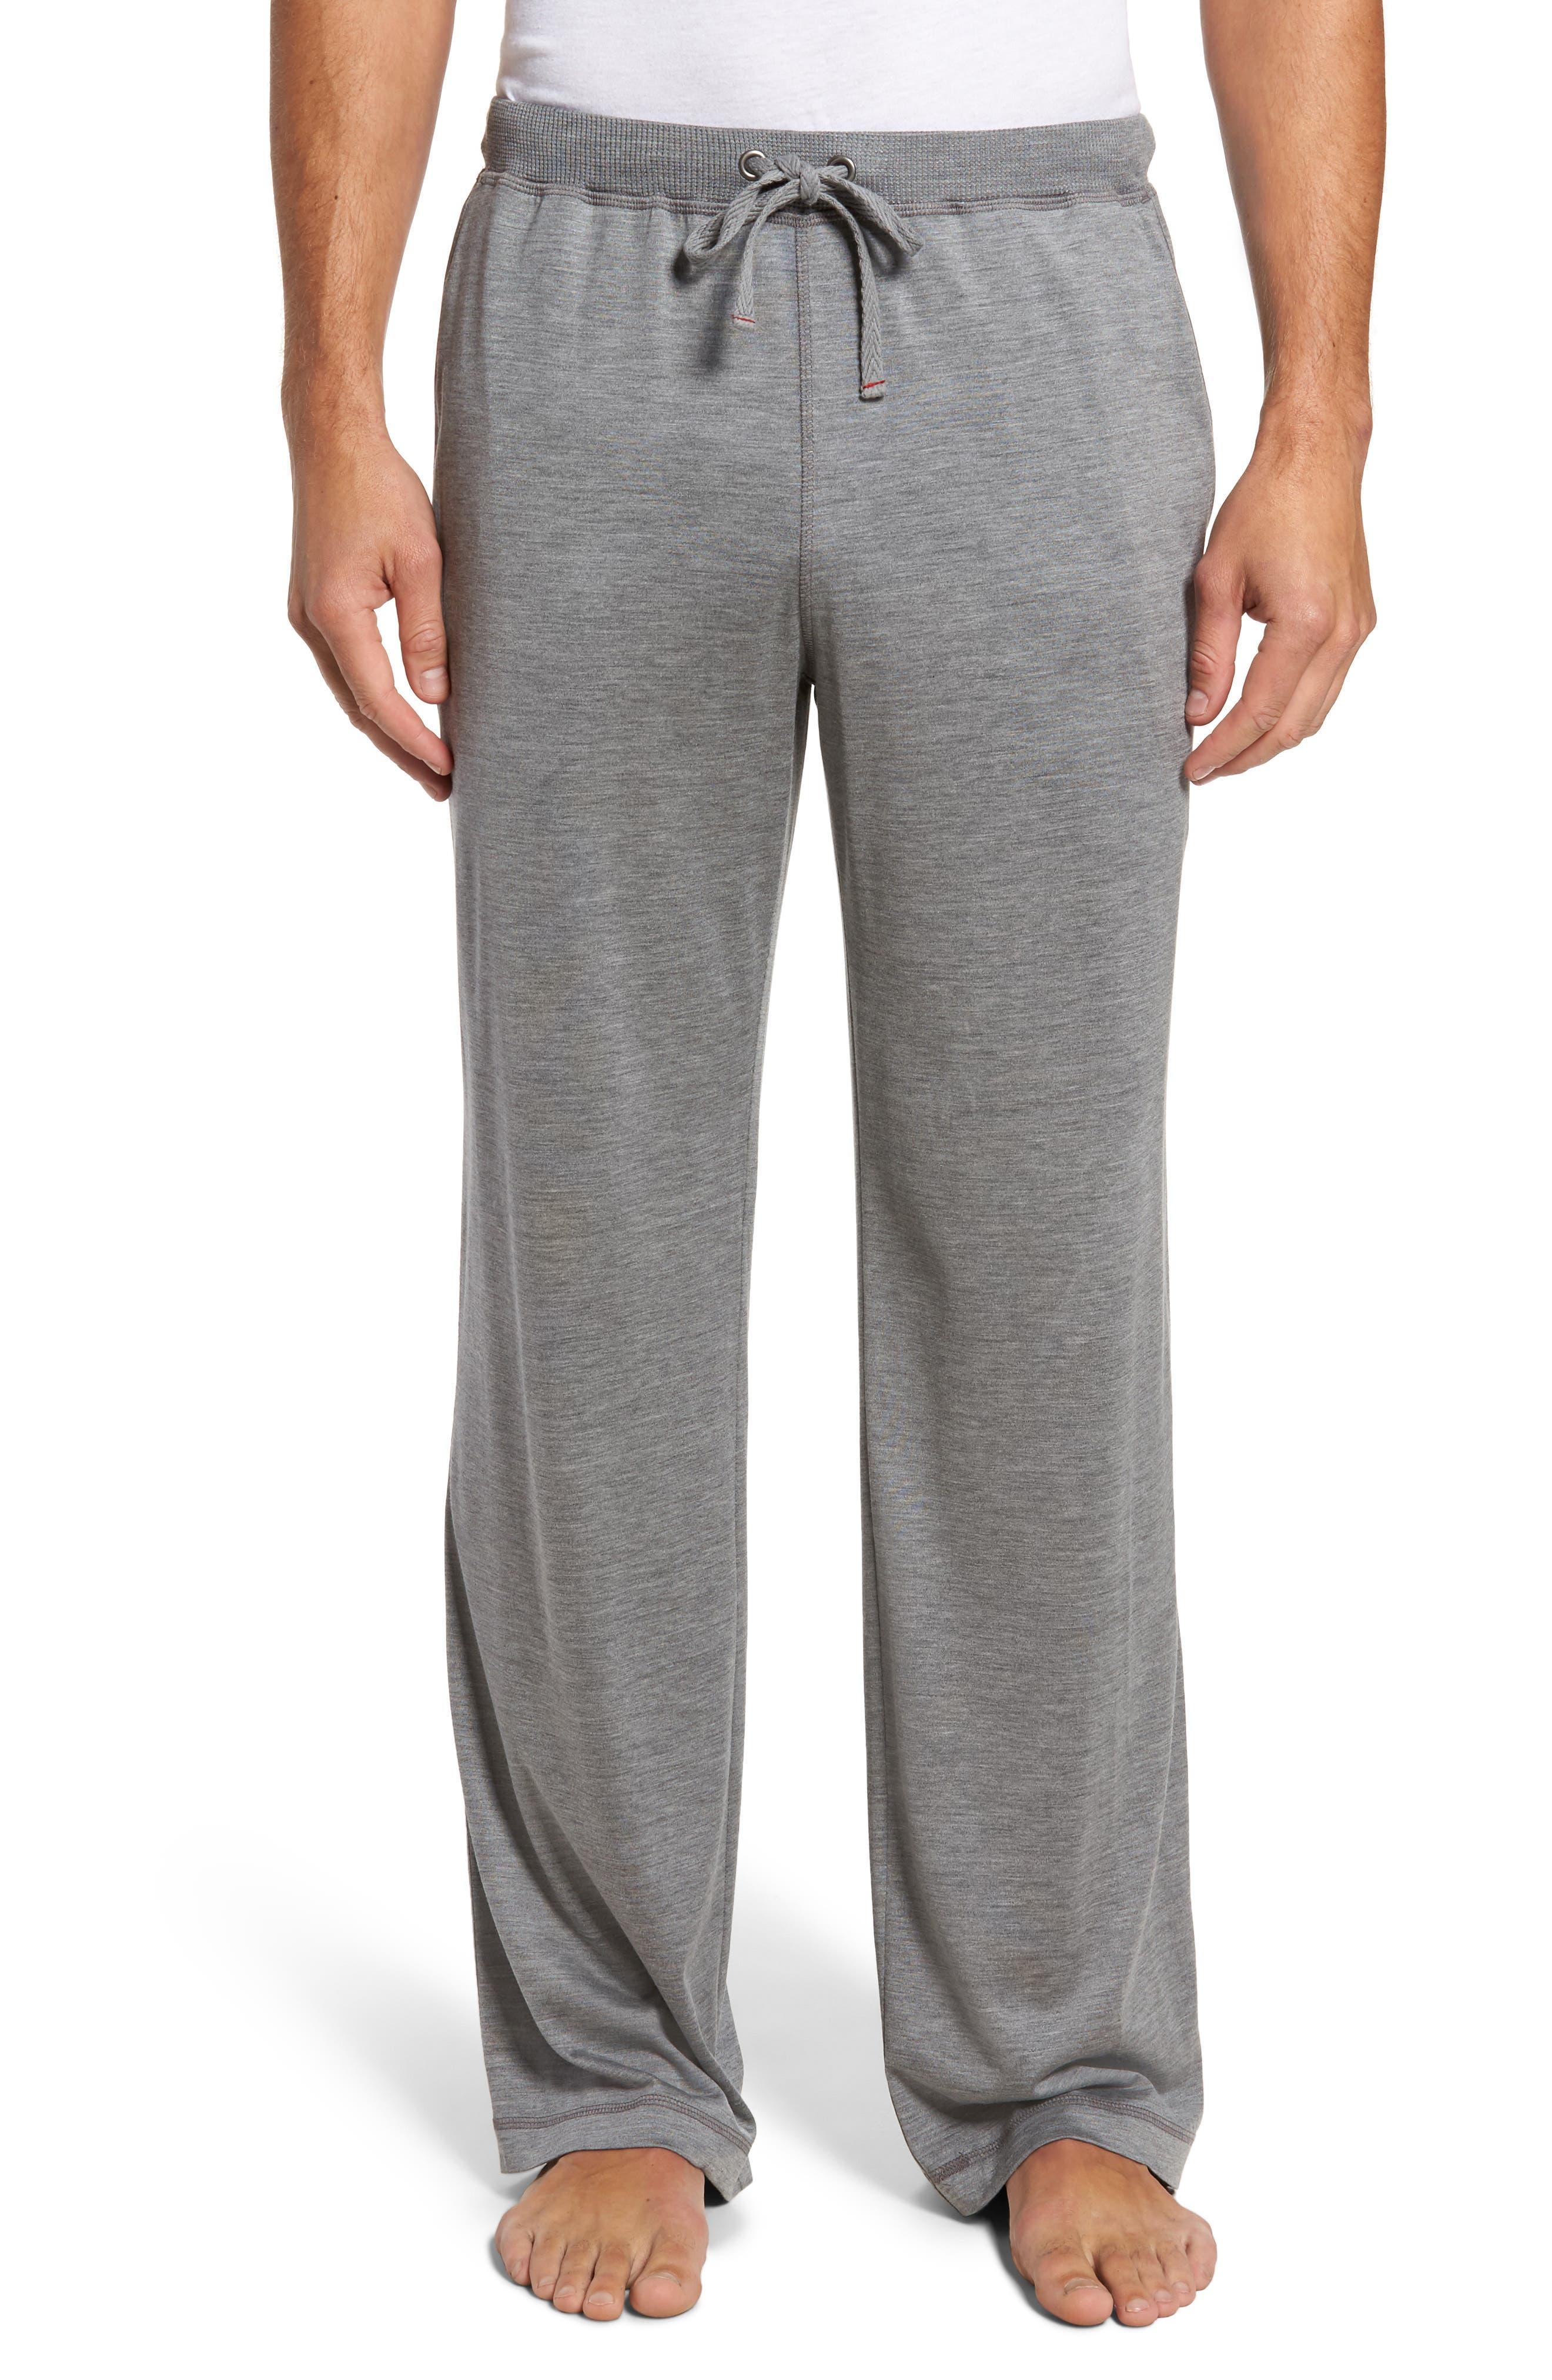 Silk & Cotton Lounge Pants,                             Main thumbnail 1, color,                             CHARCOAL HEATHER